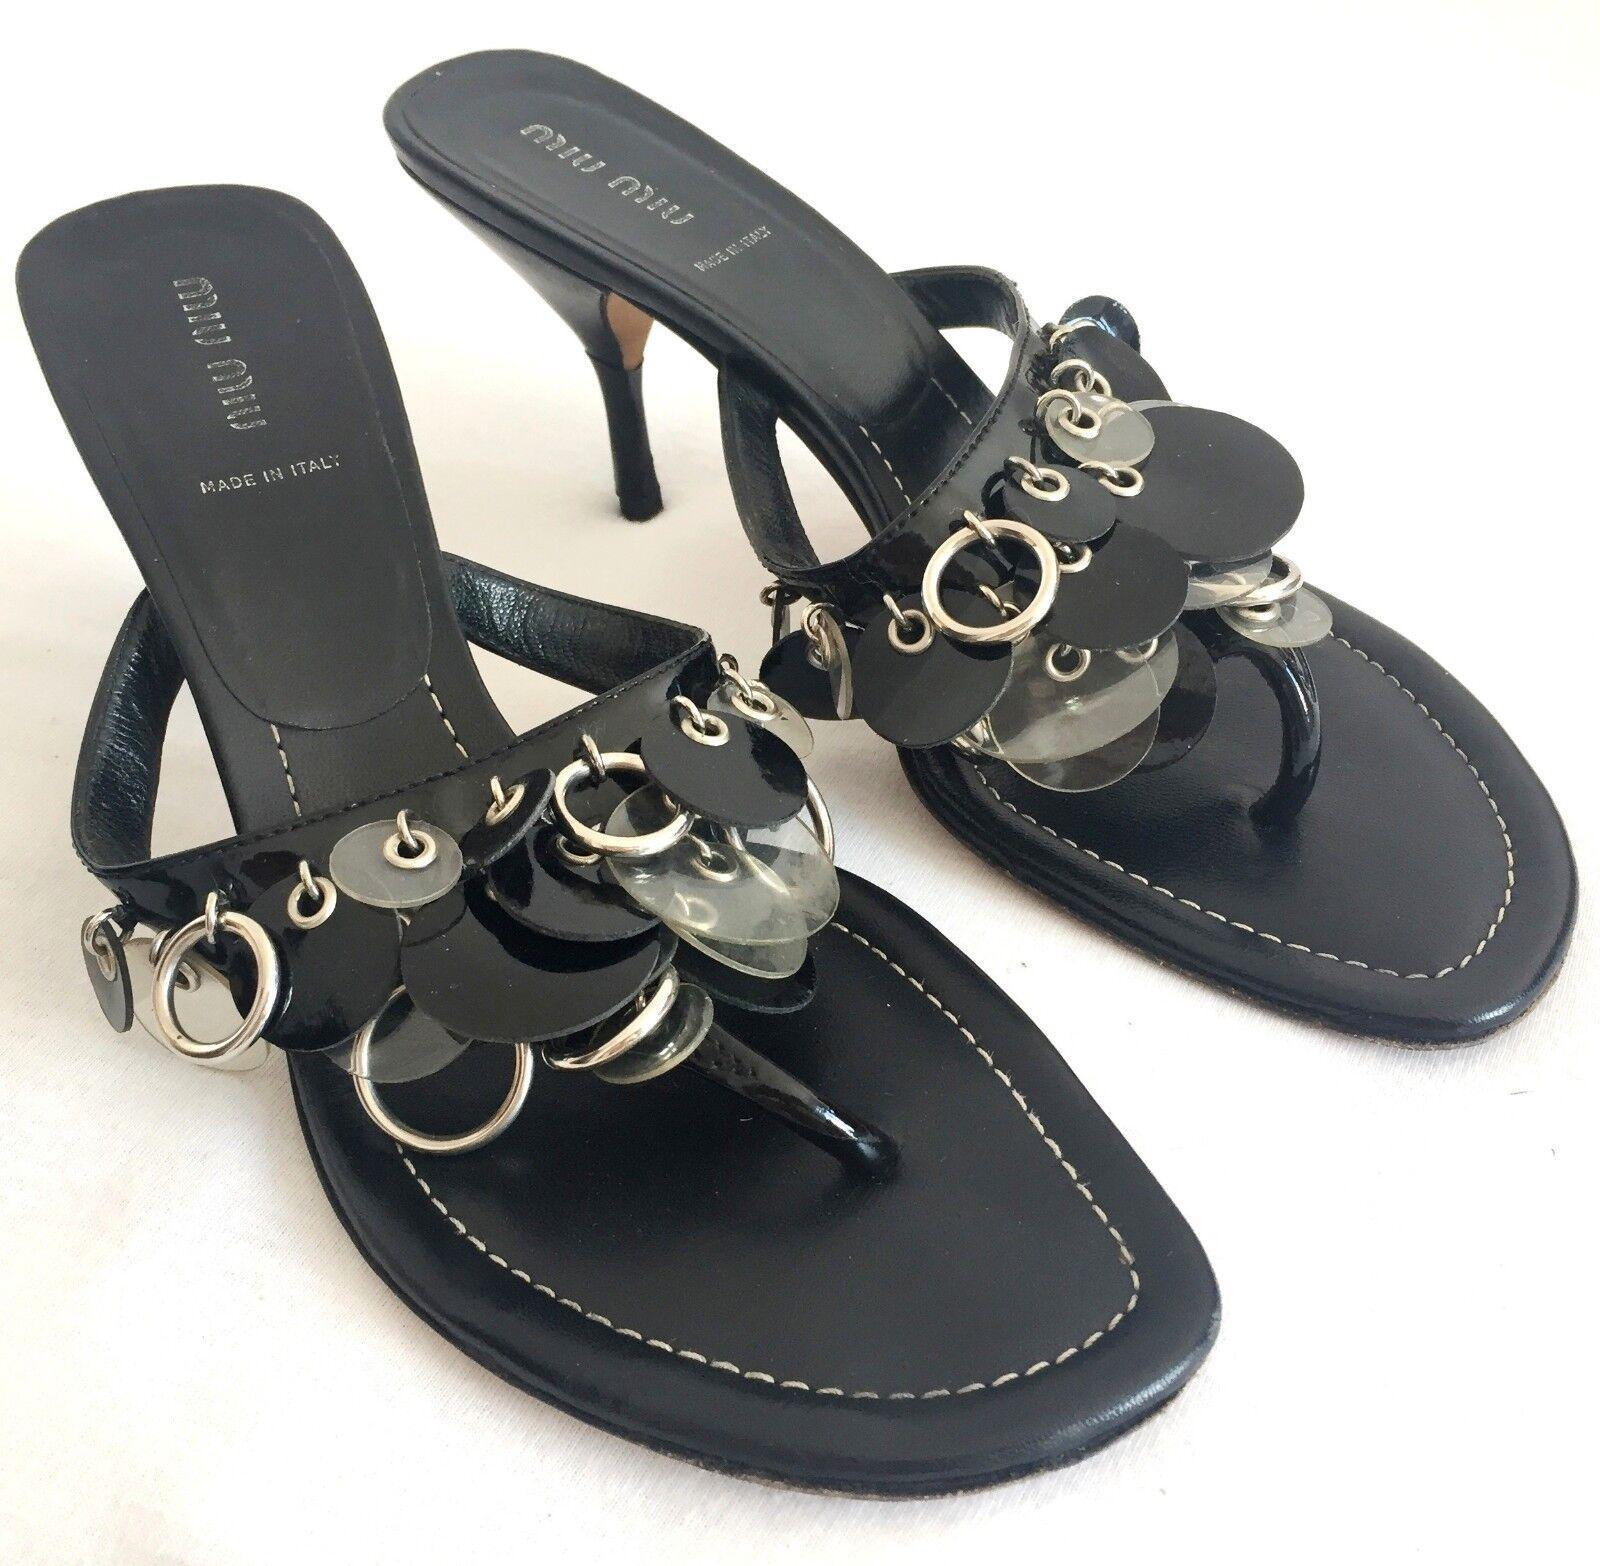 MIU PRADA Womens Patent Leather shoes Without Hanger Heel Toe Separators Black 41 11